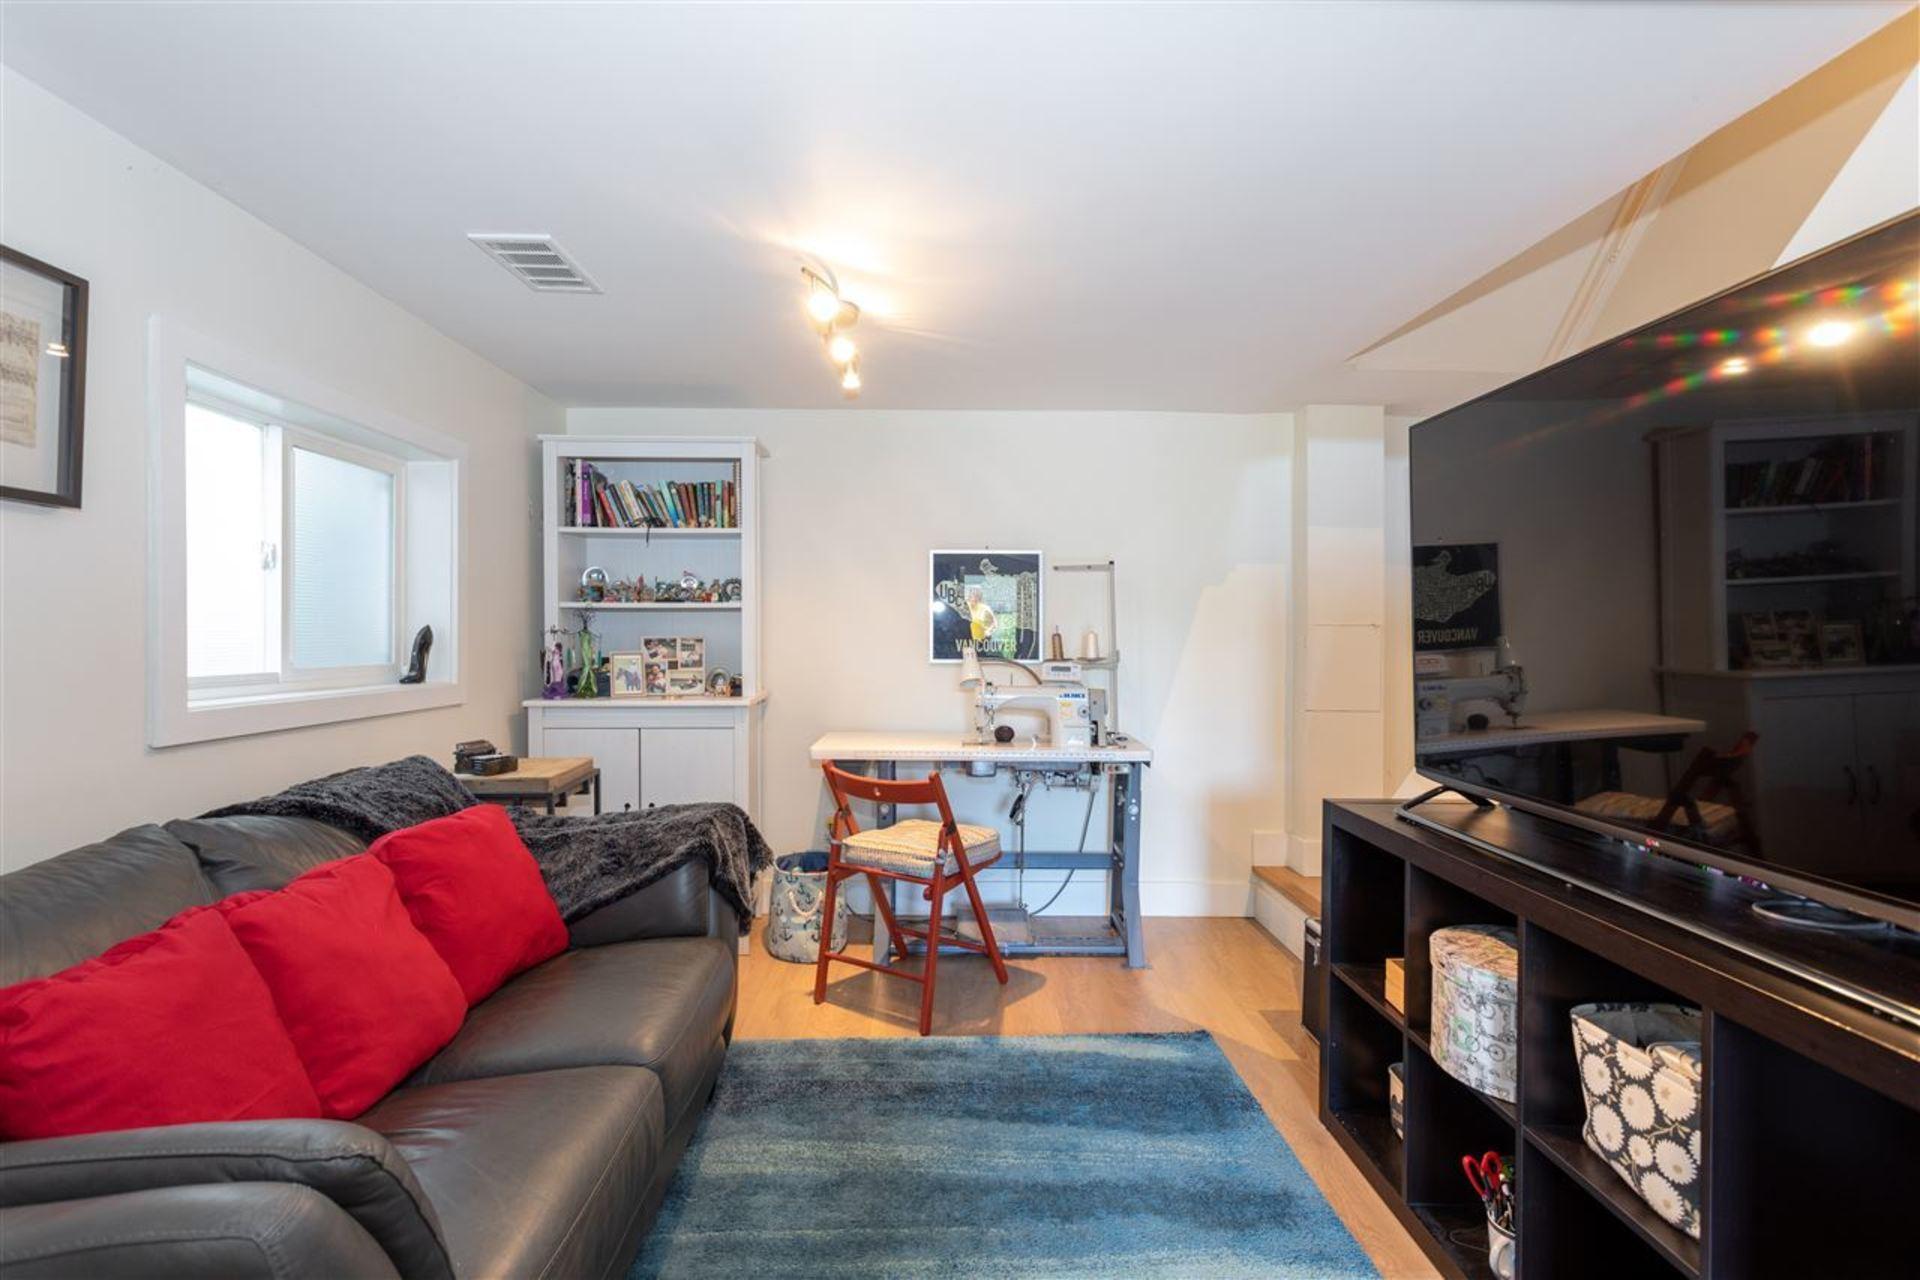 3912-parker-street-willingdon-heights-burnaby-north-14 at 3912 Parker Street, Willingdon Heights, Burnaby North